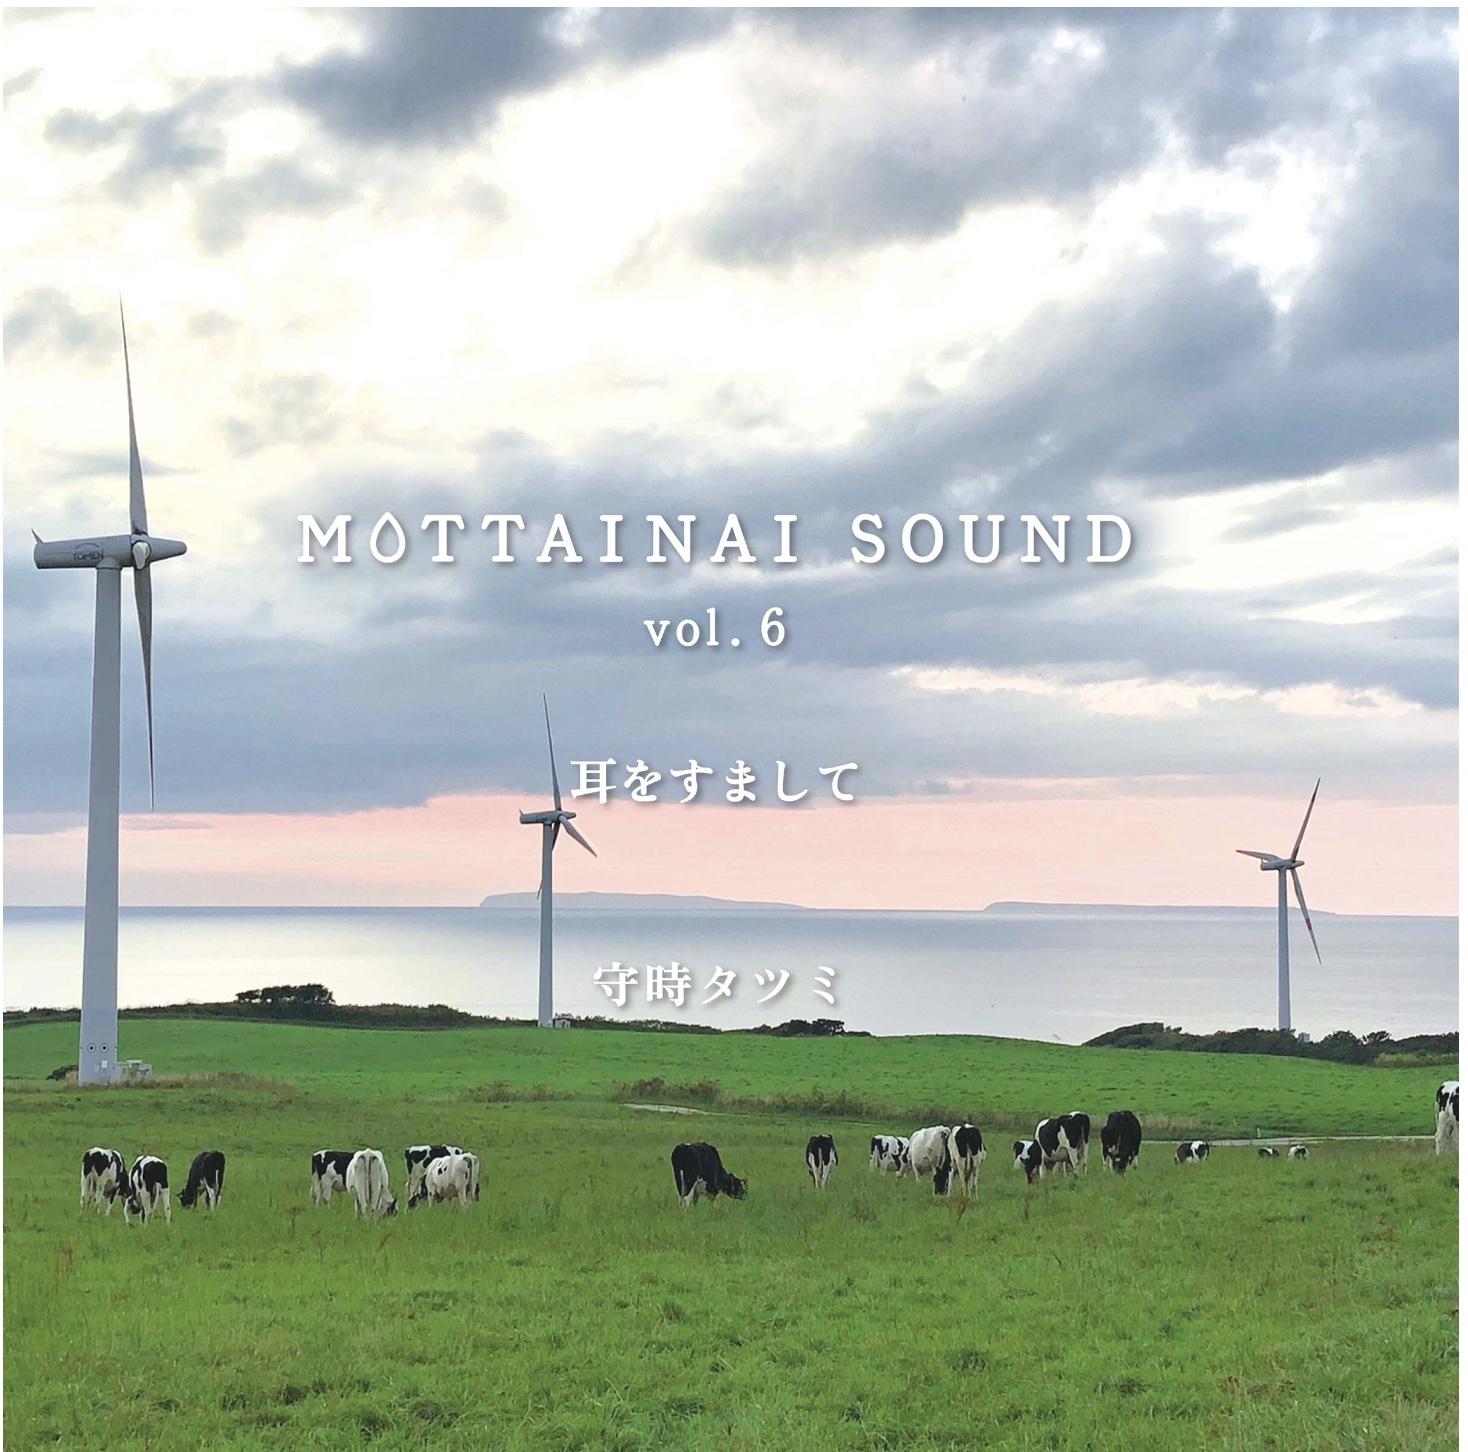 MOTTAINAI SOUND vol.6 耳をすまして